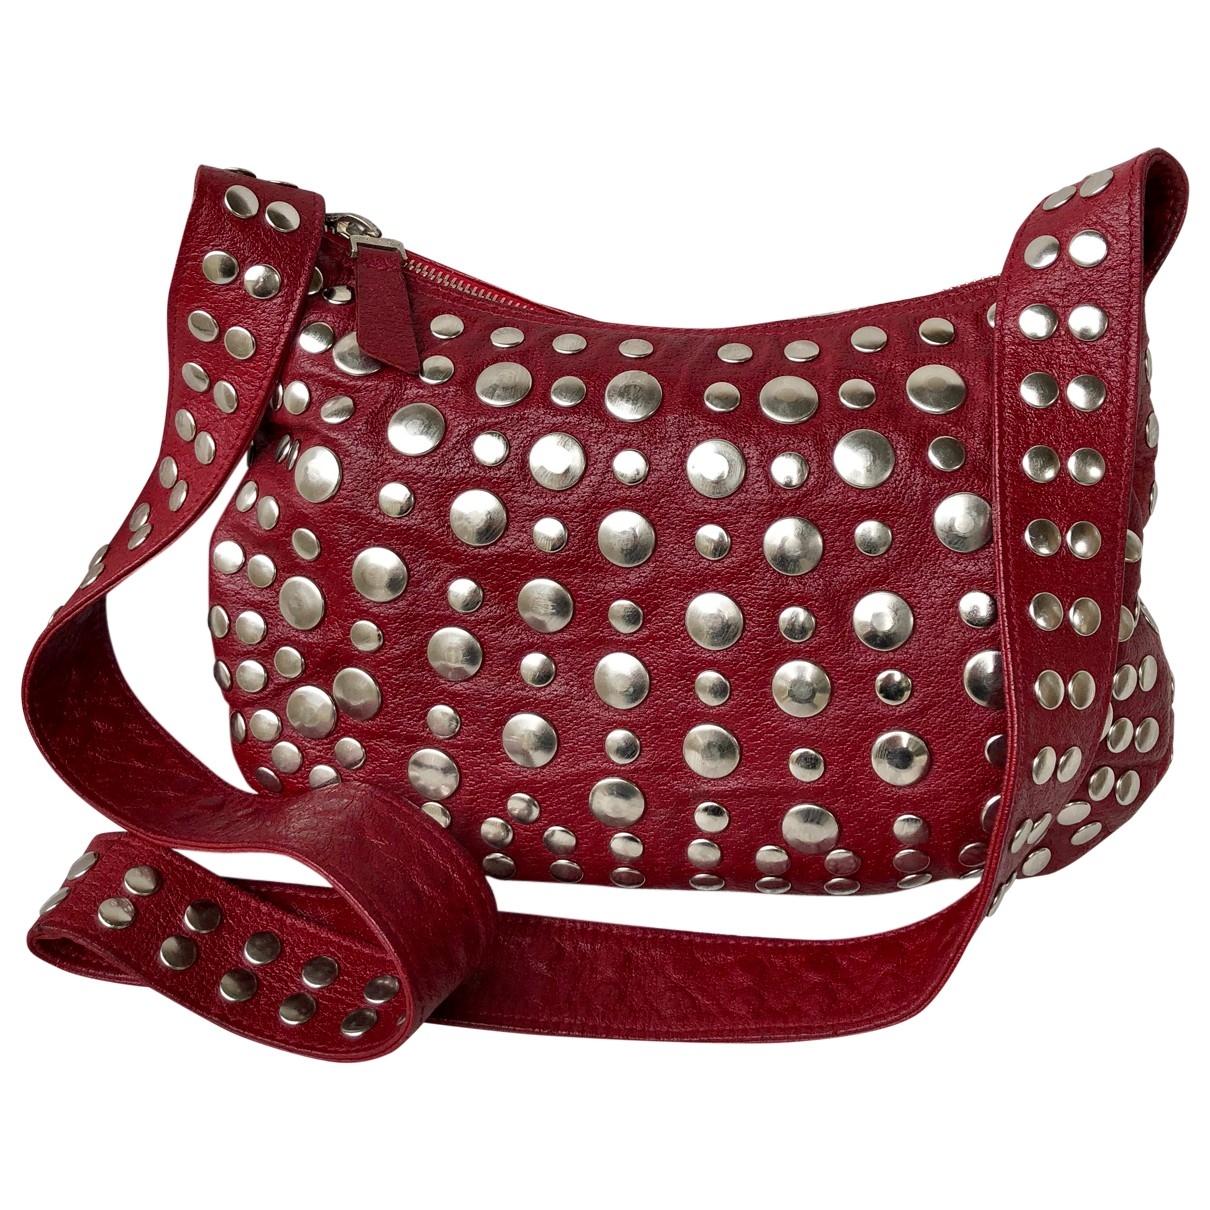 Marni \N Handtasche in  Bordeauxrot Leder